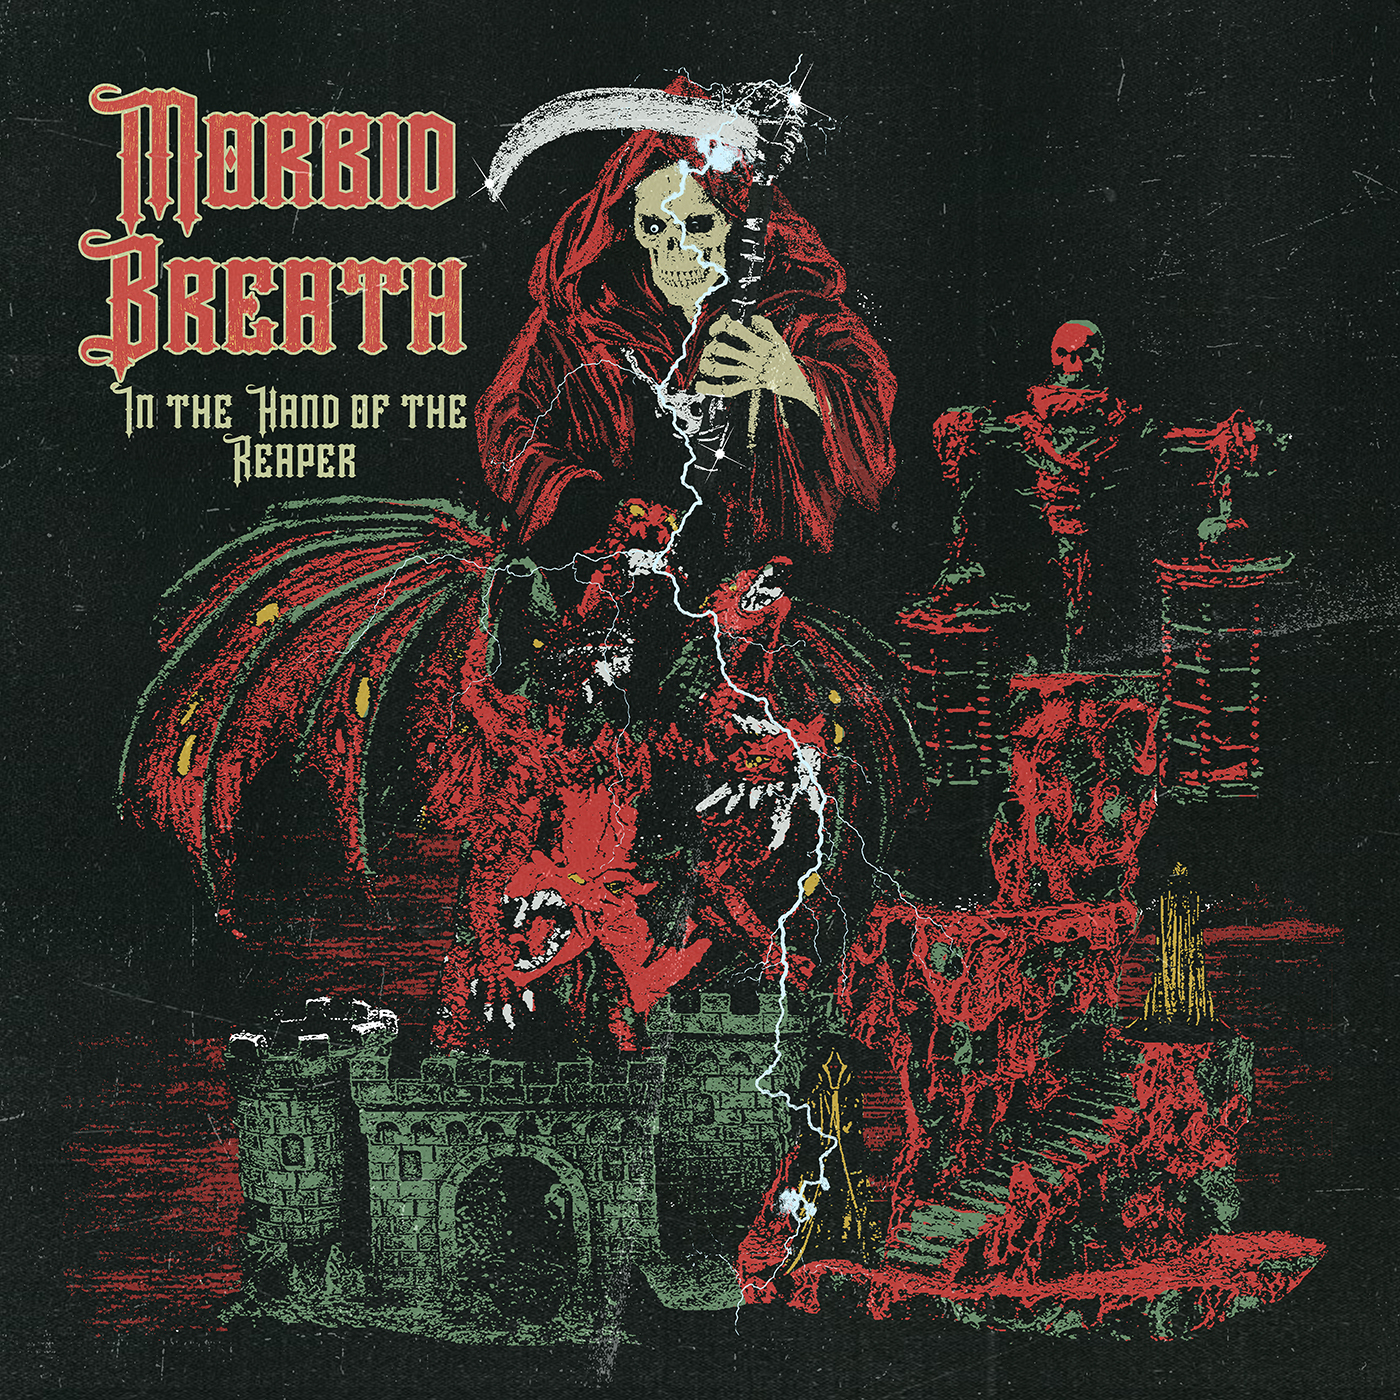 MORBID BREATH - In the Hand of the Reaper